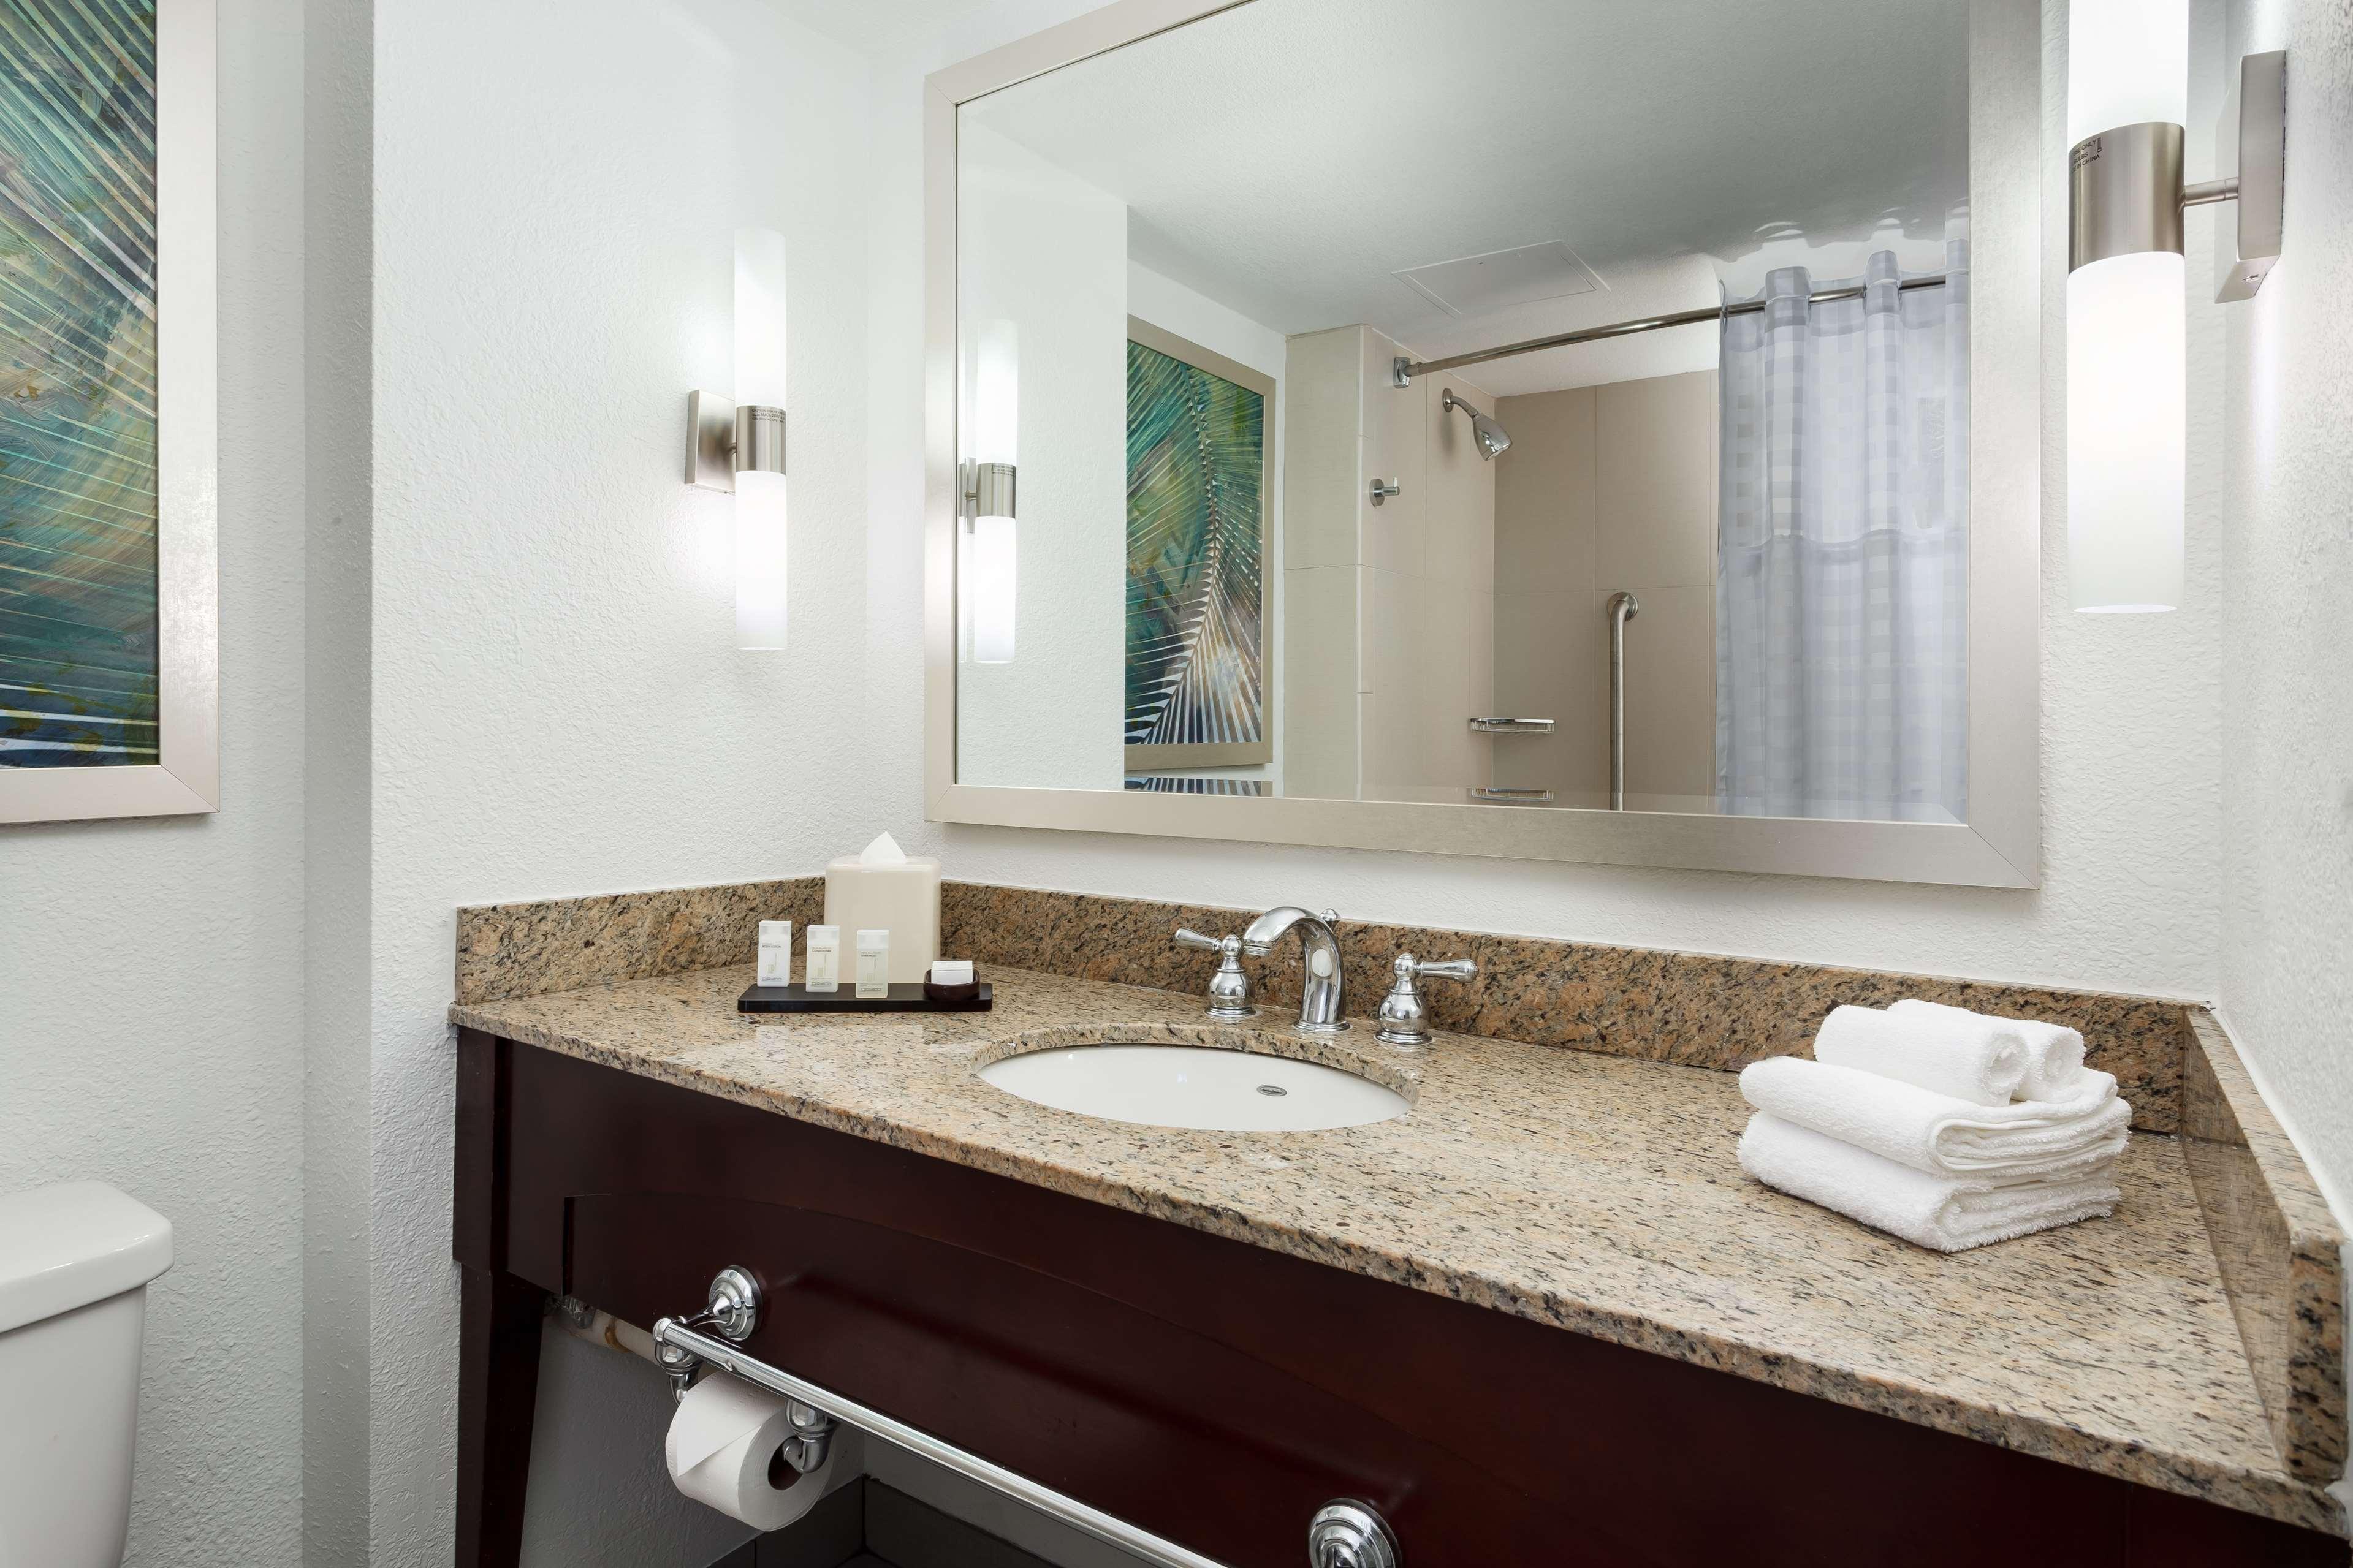 Embassy Suites by Hilton Orlando Lake Buena Vista Resort image 18